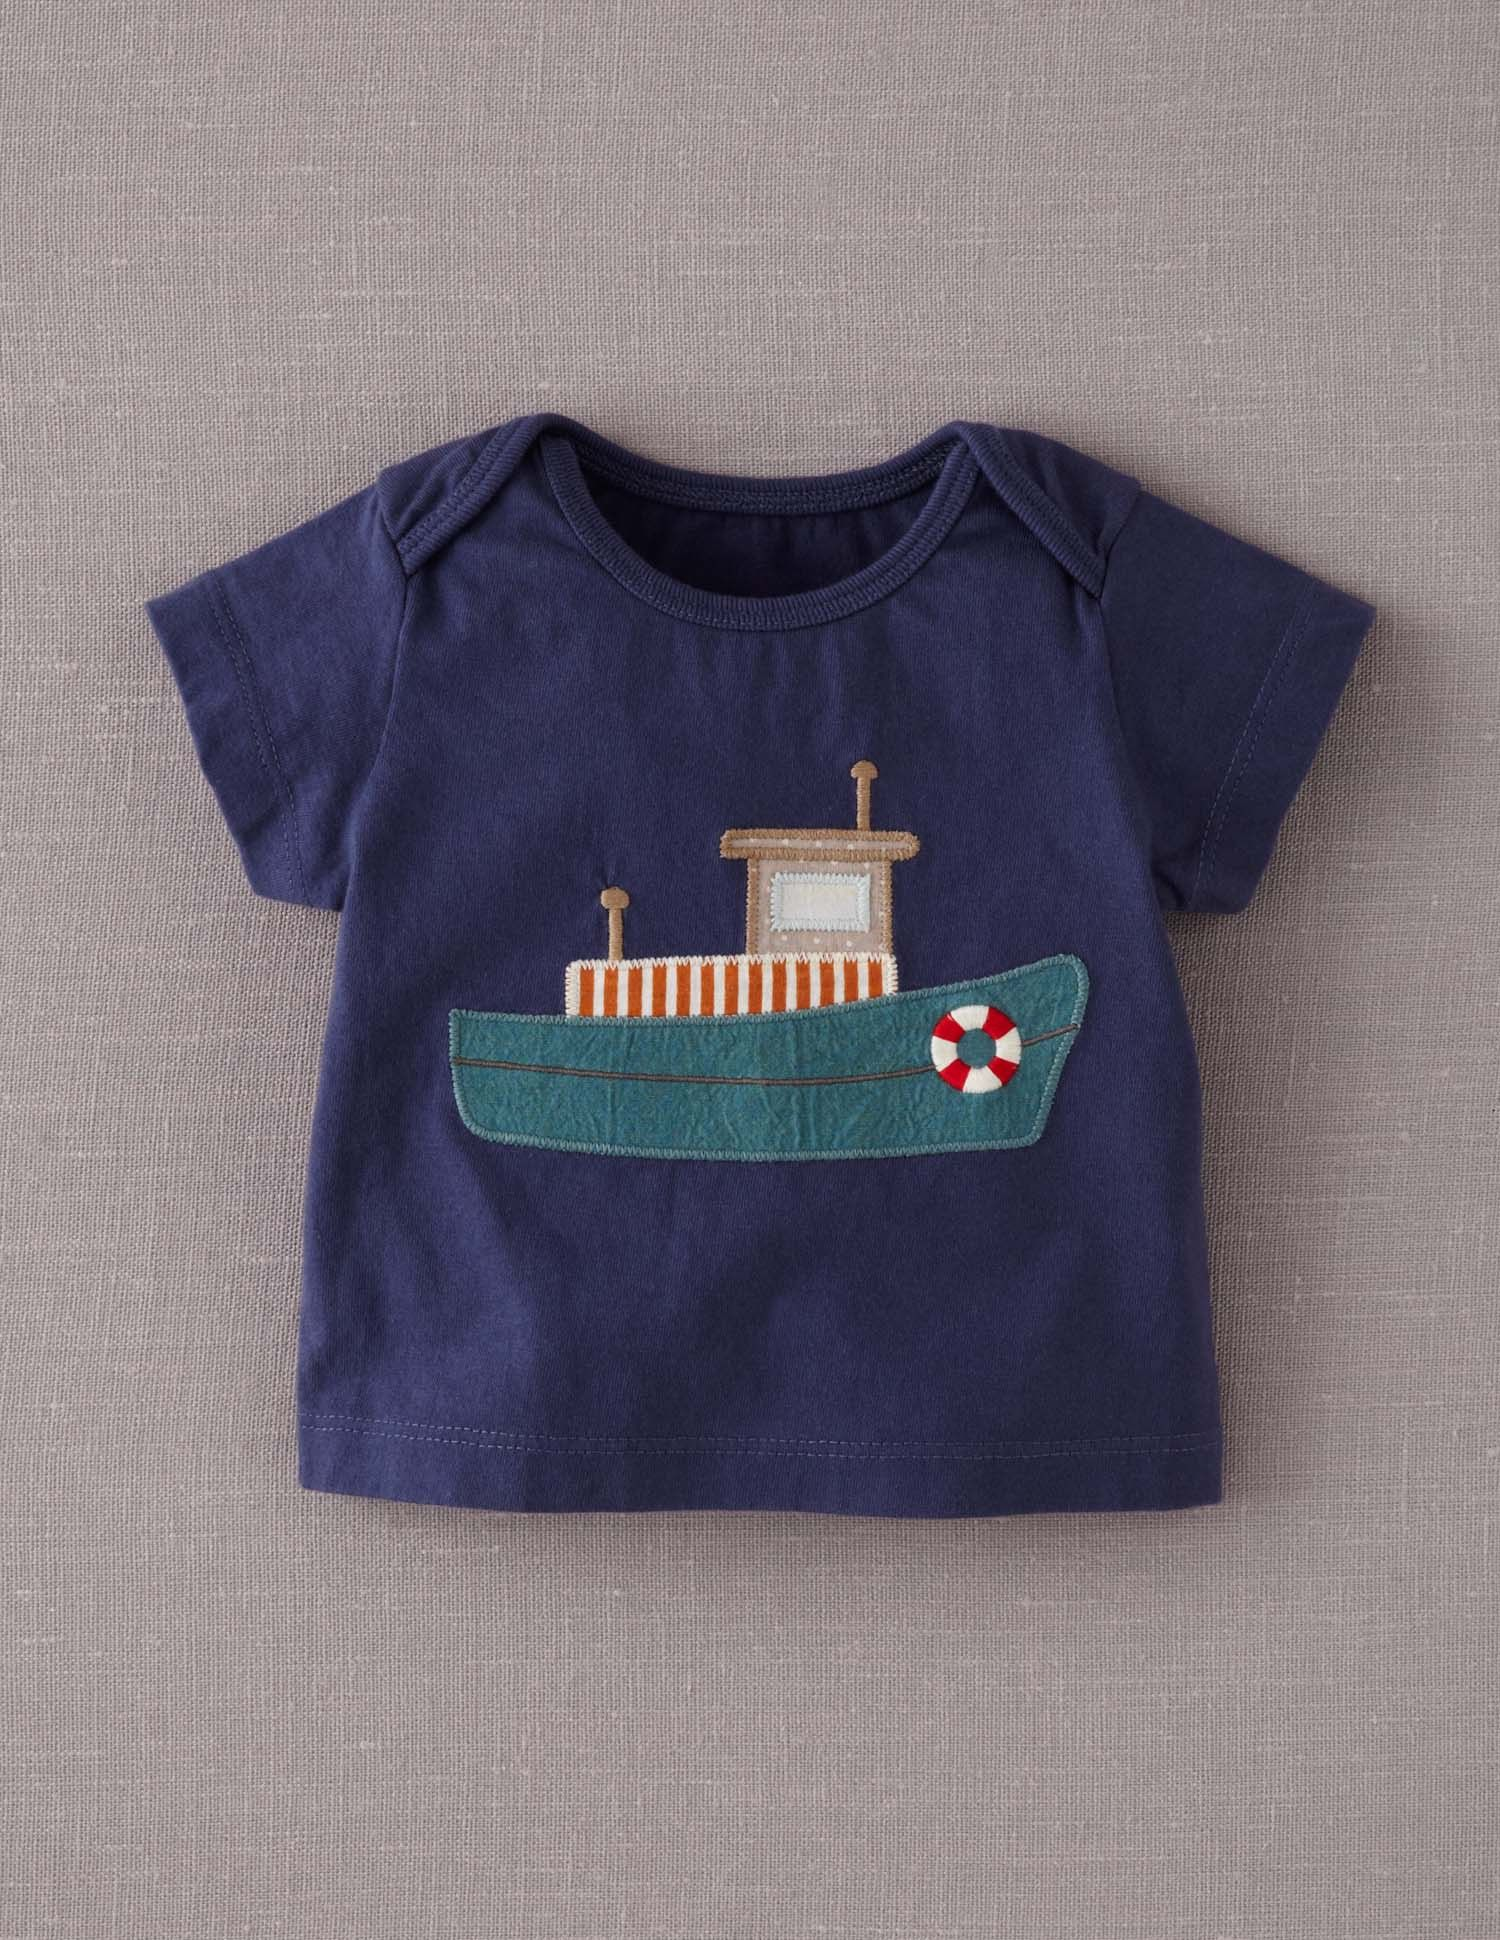 Vehicle appliqu t shirt aplicacions roba pinterest for Bodendirect code